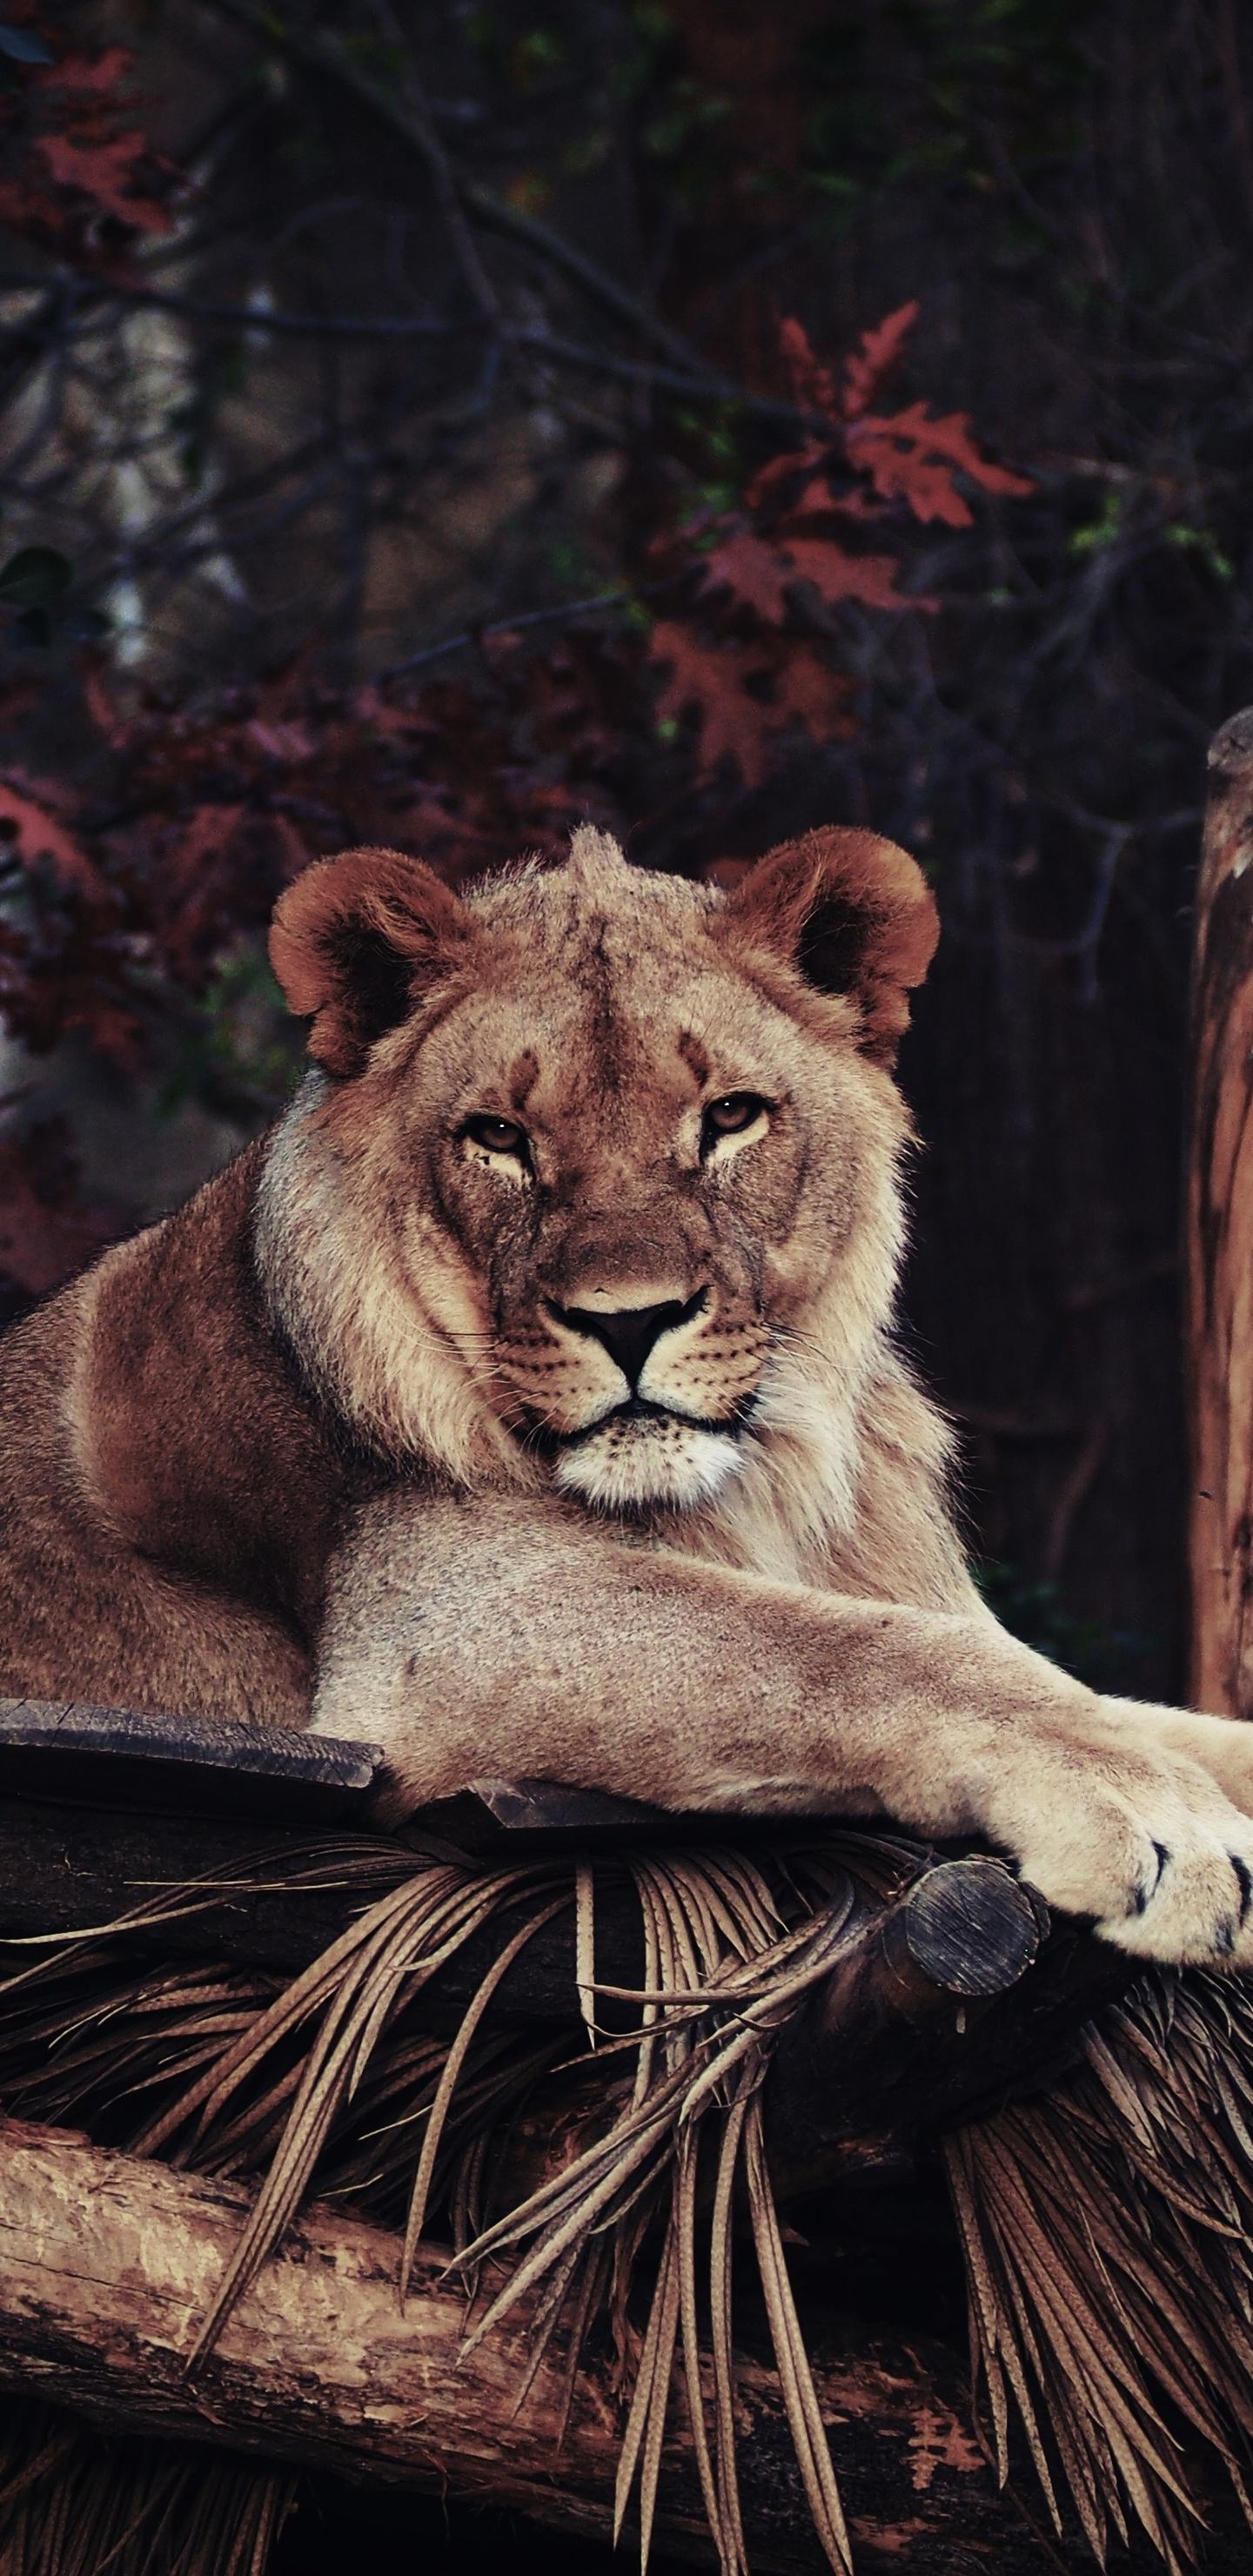 1440x2960 Lion In Zoo 4k Samsung Galaxy Note 9 8 S9 S8 S8 Qhd Hd